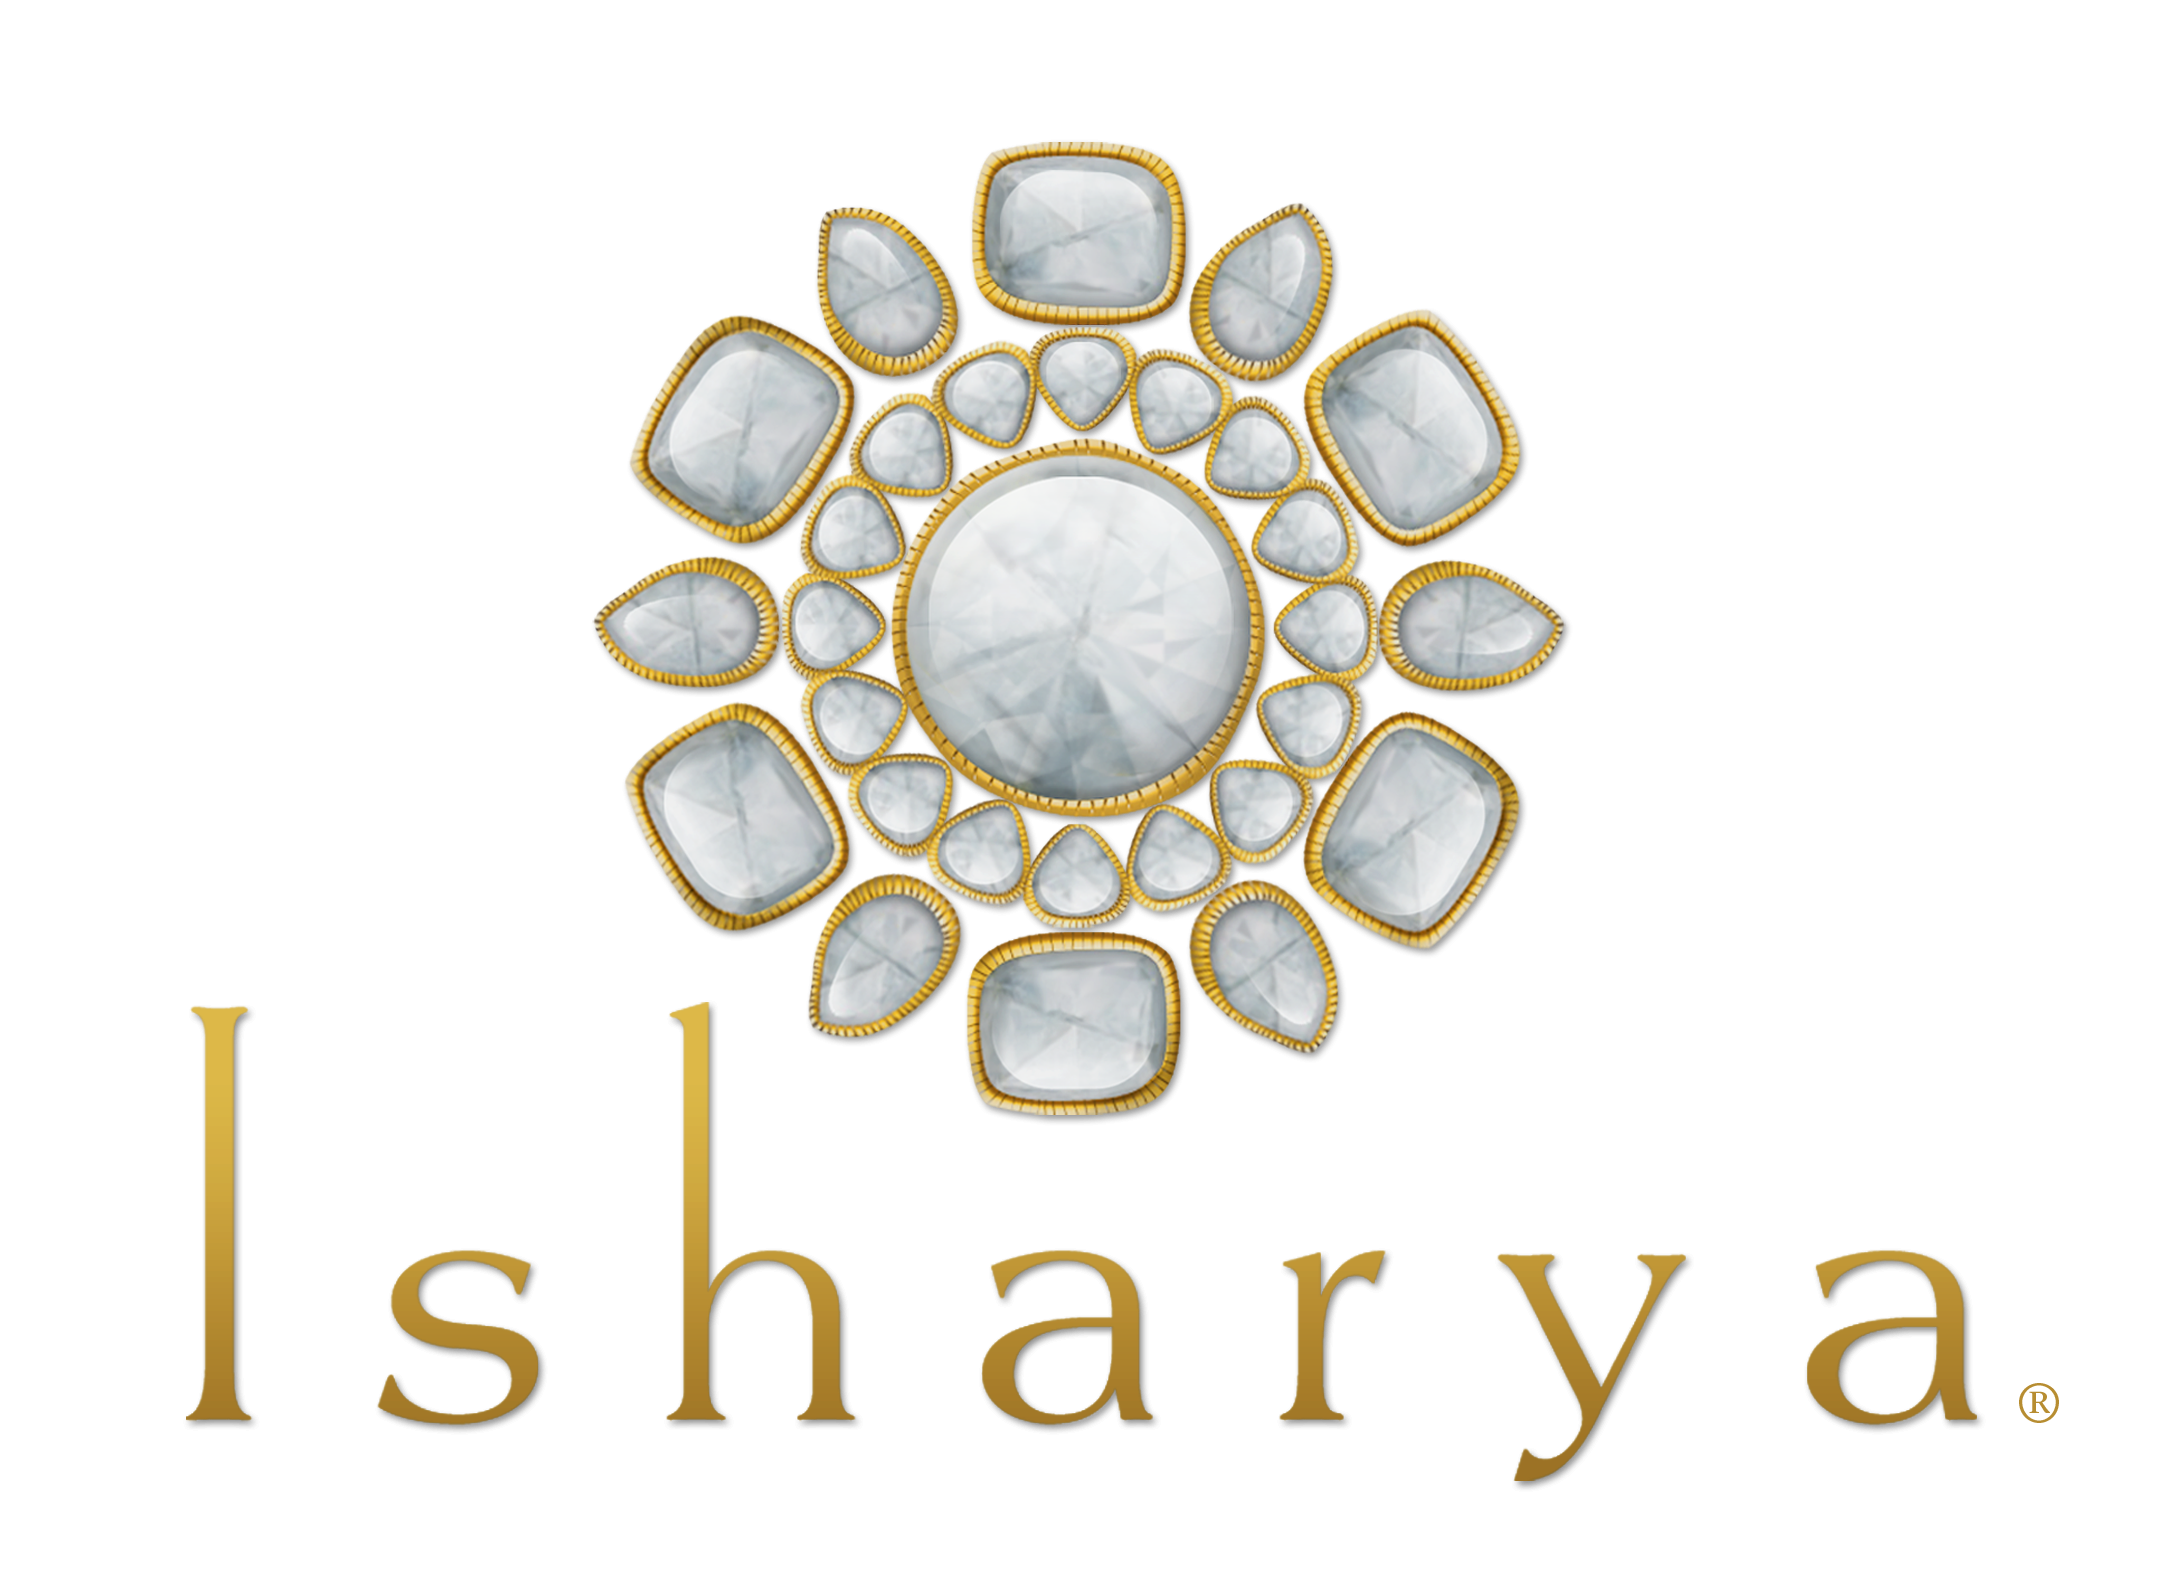 Isharya Logo Wallpaper